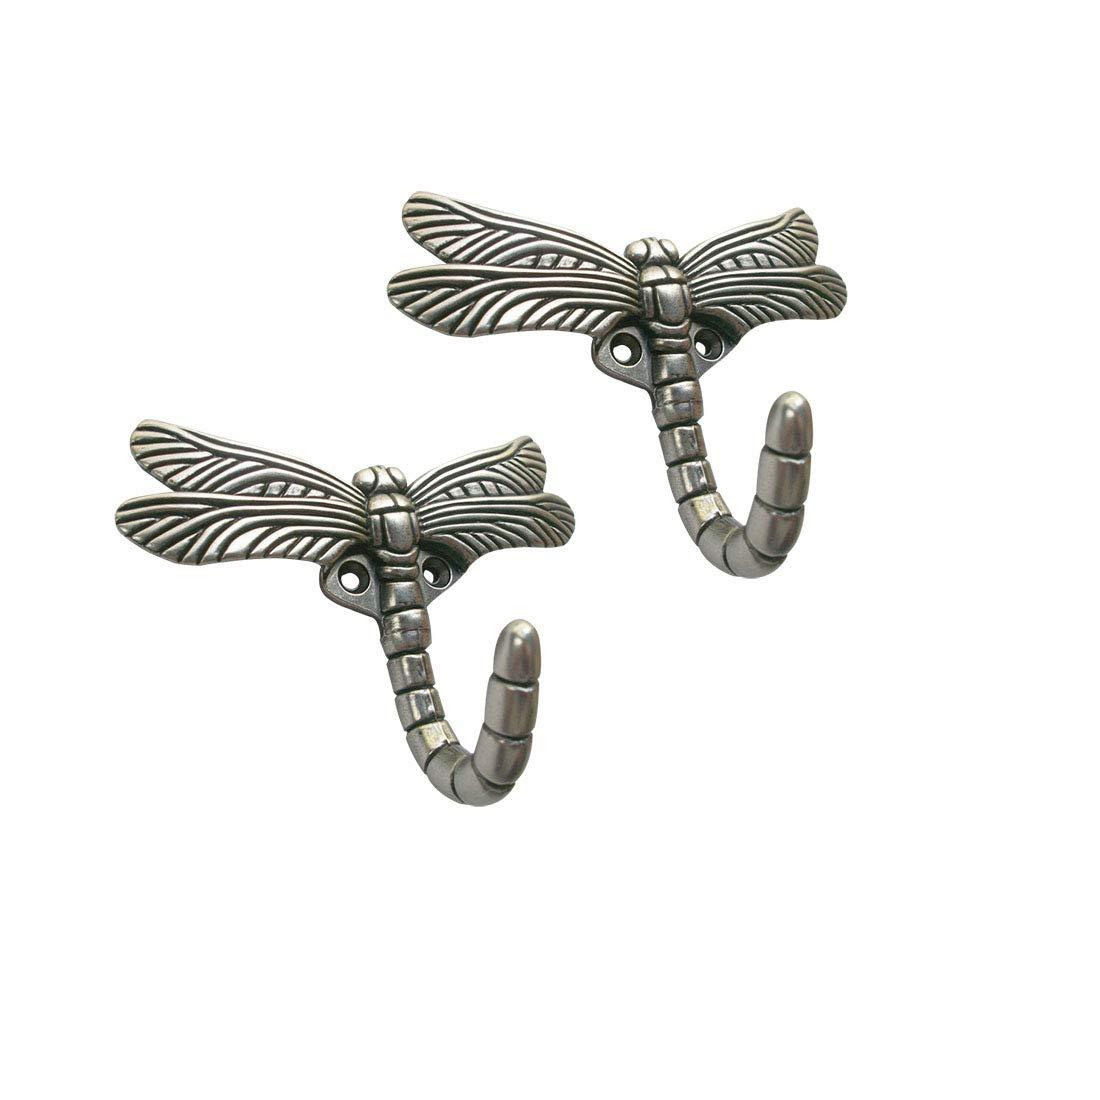 YEJI 2 Hooks Silver Antique Dragonfly Decorative Hooks for Kitchen Bathroom Mirror Towel Robe Coat Key Pewter Hooks Large Wall Door Holder Hook Hanger